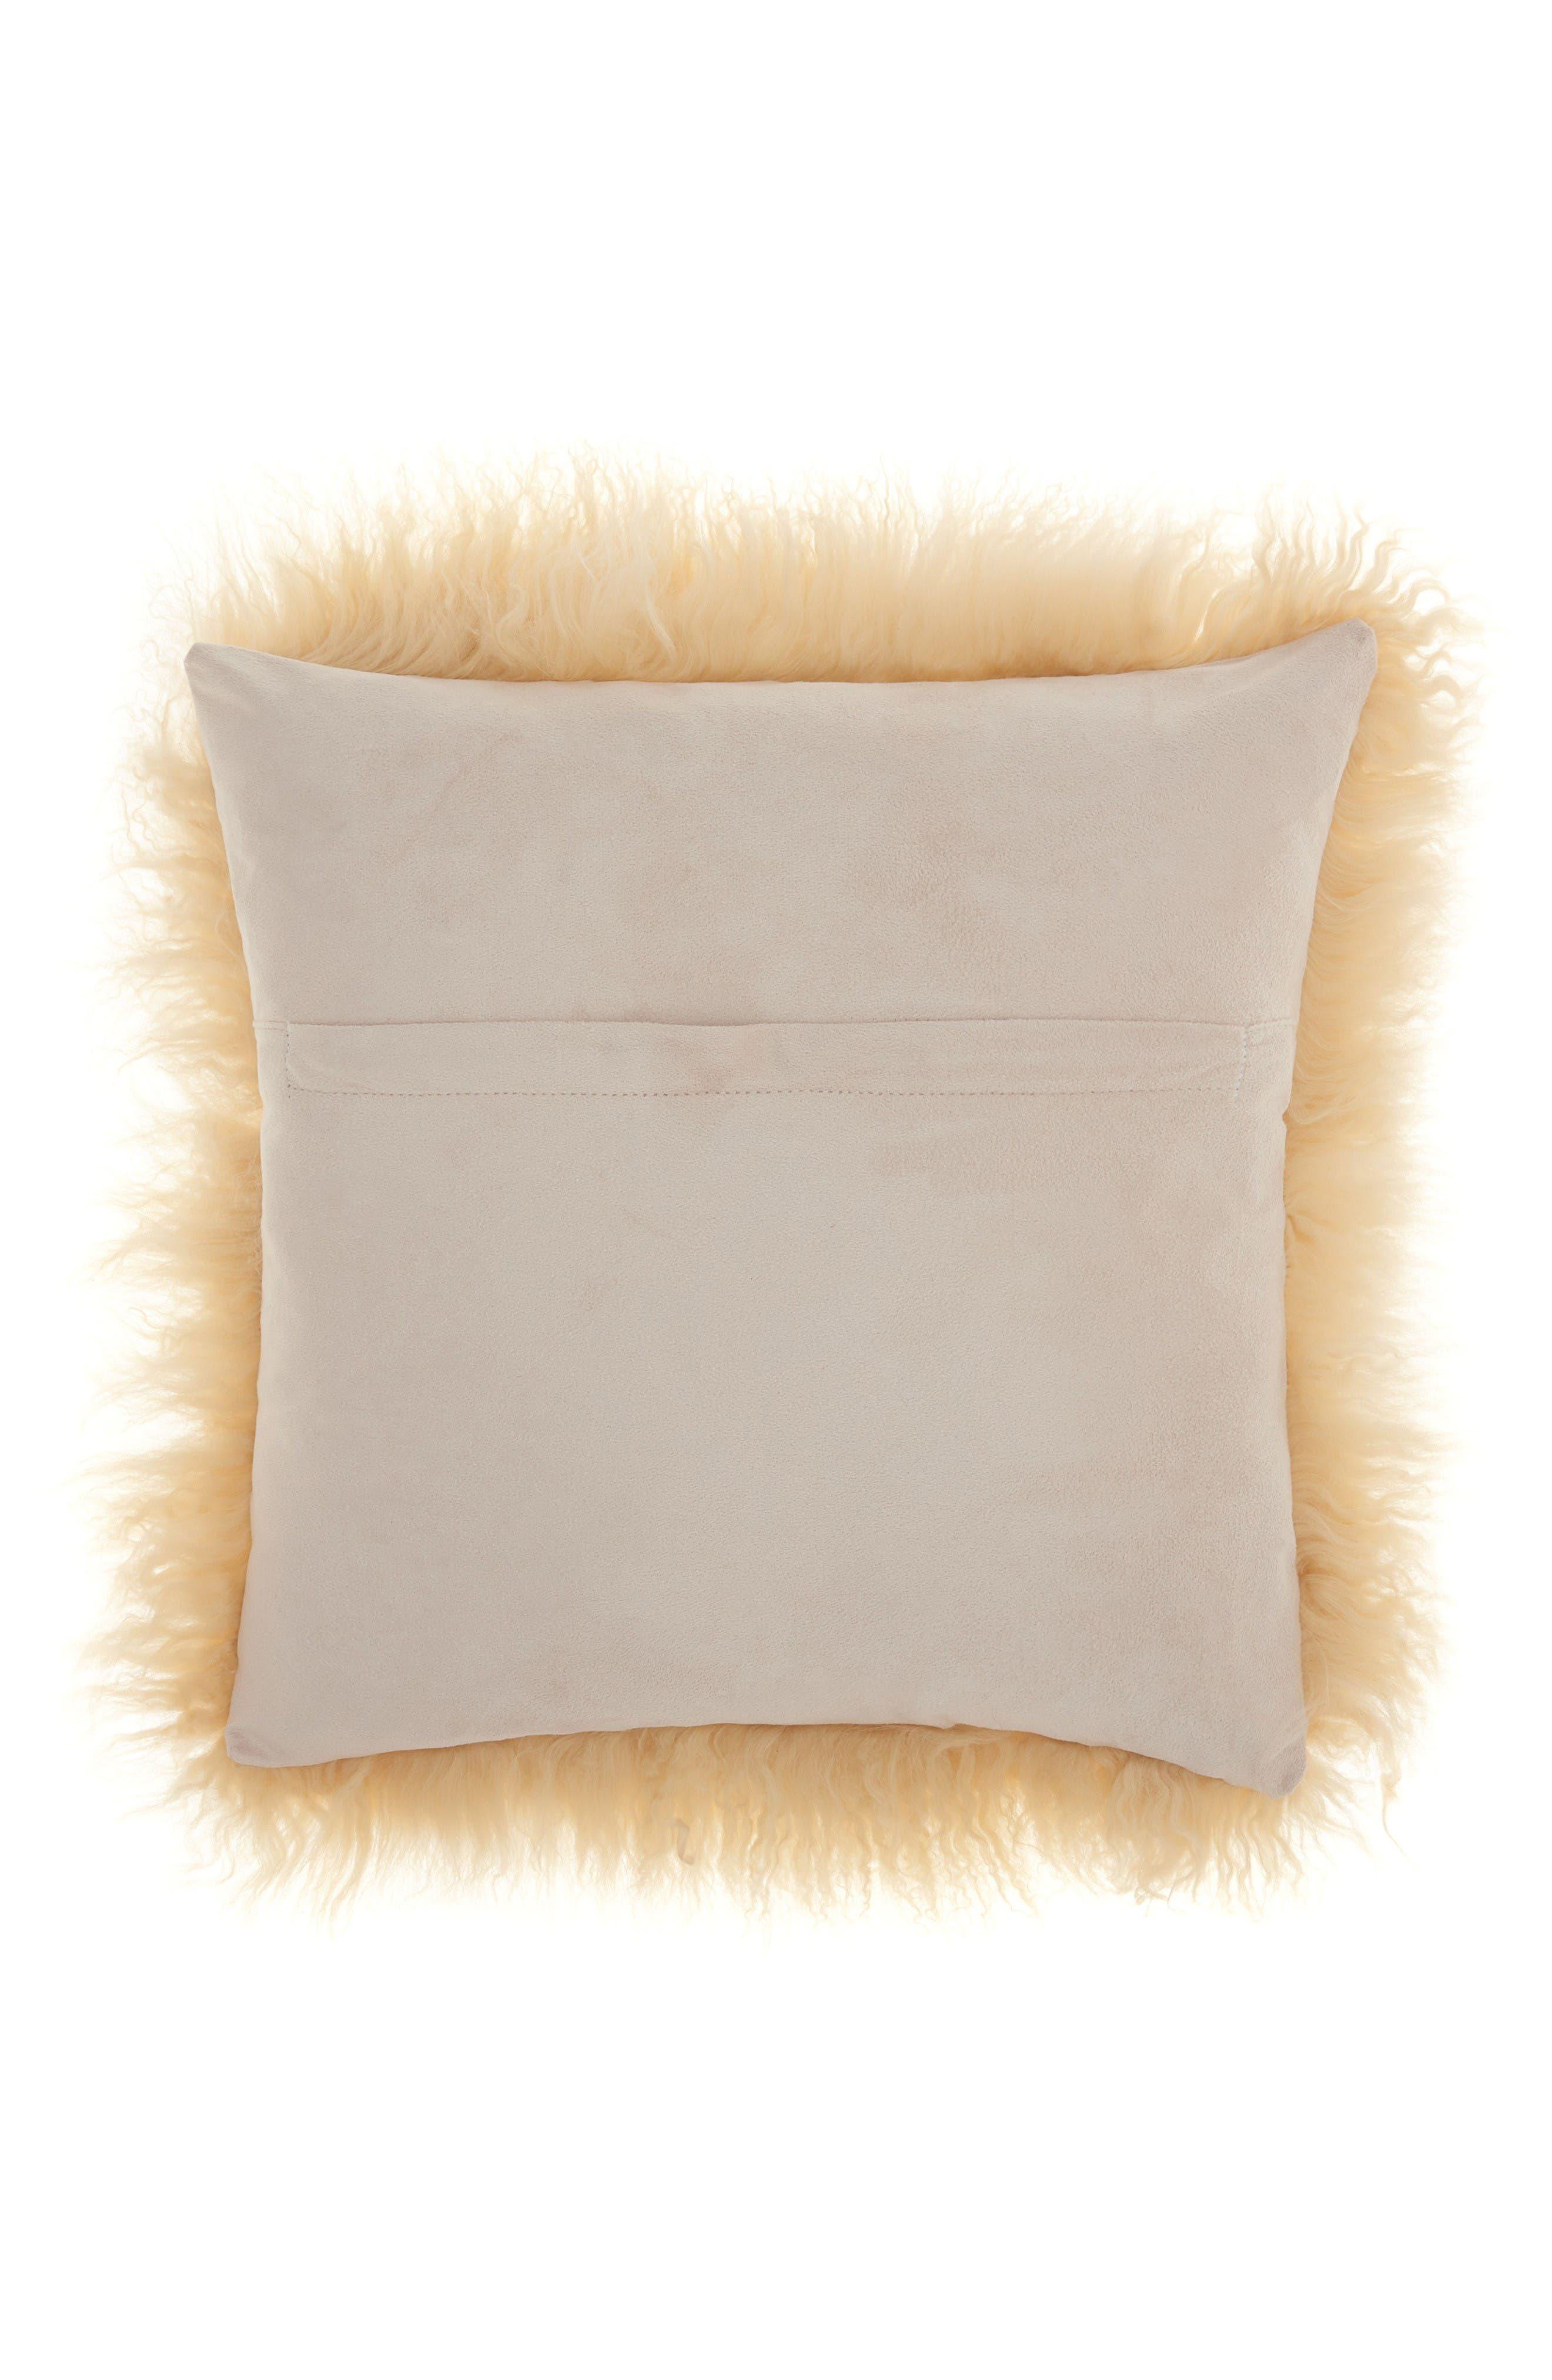 decorative pillows home decor  nordstrom -